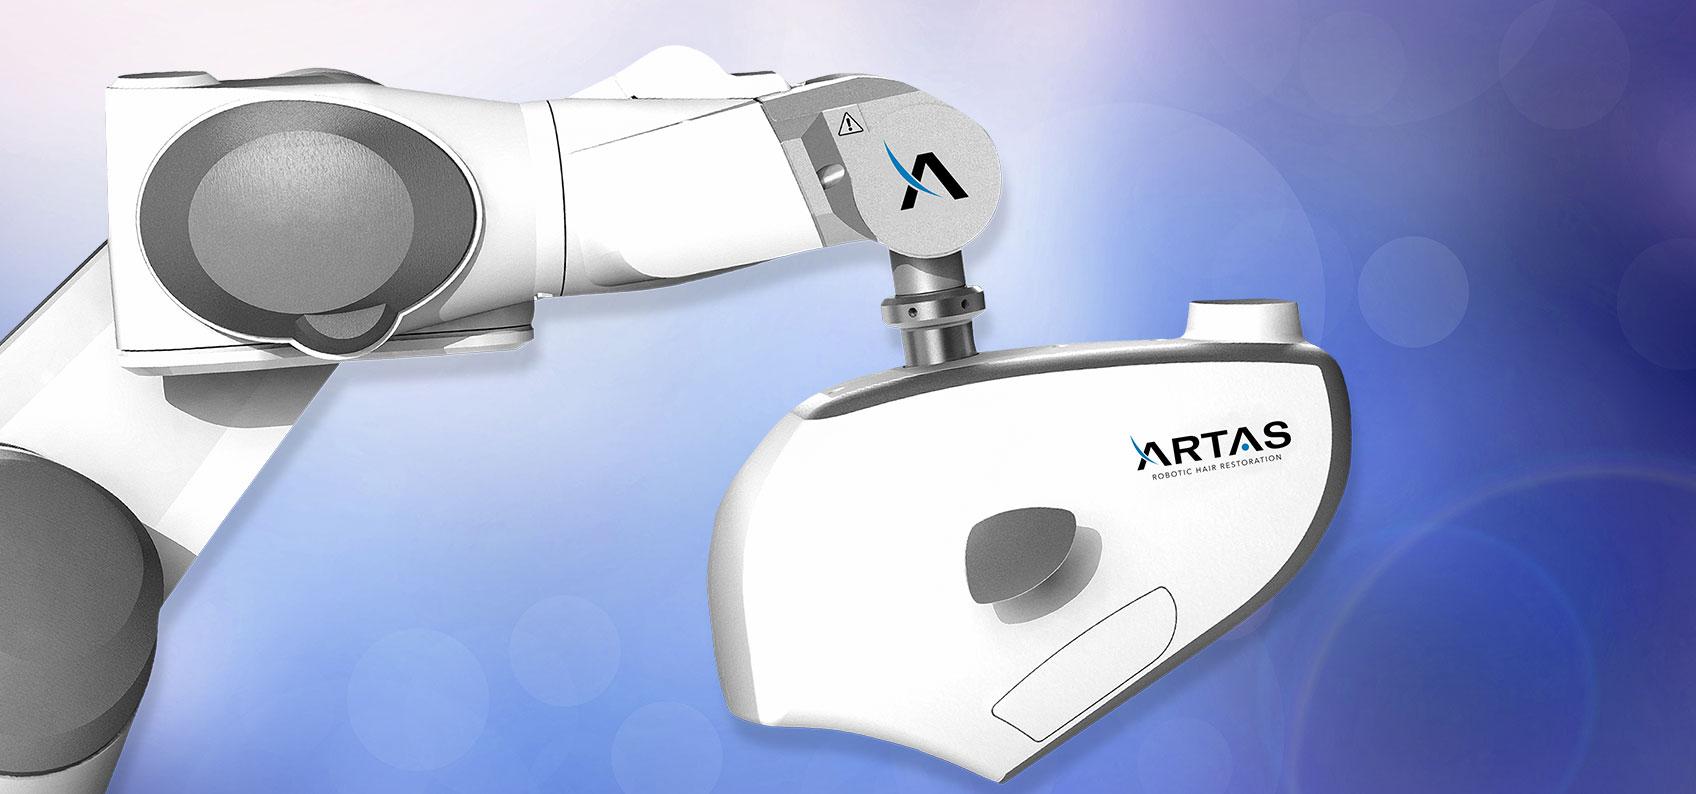 the ARTAS Hair Transplant Robot